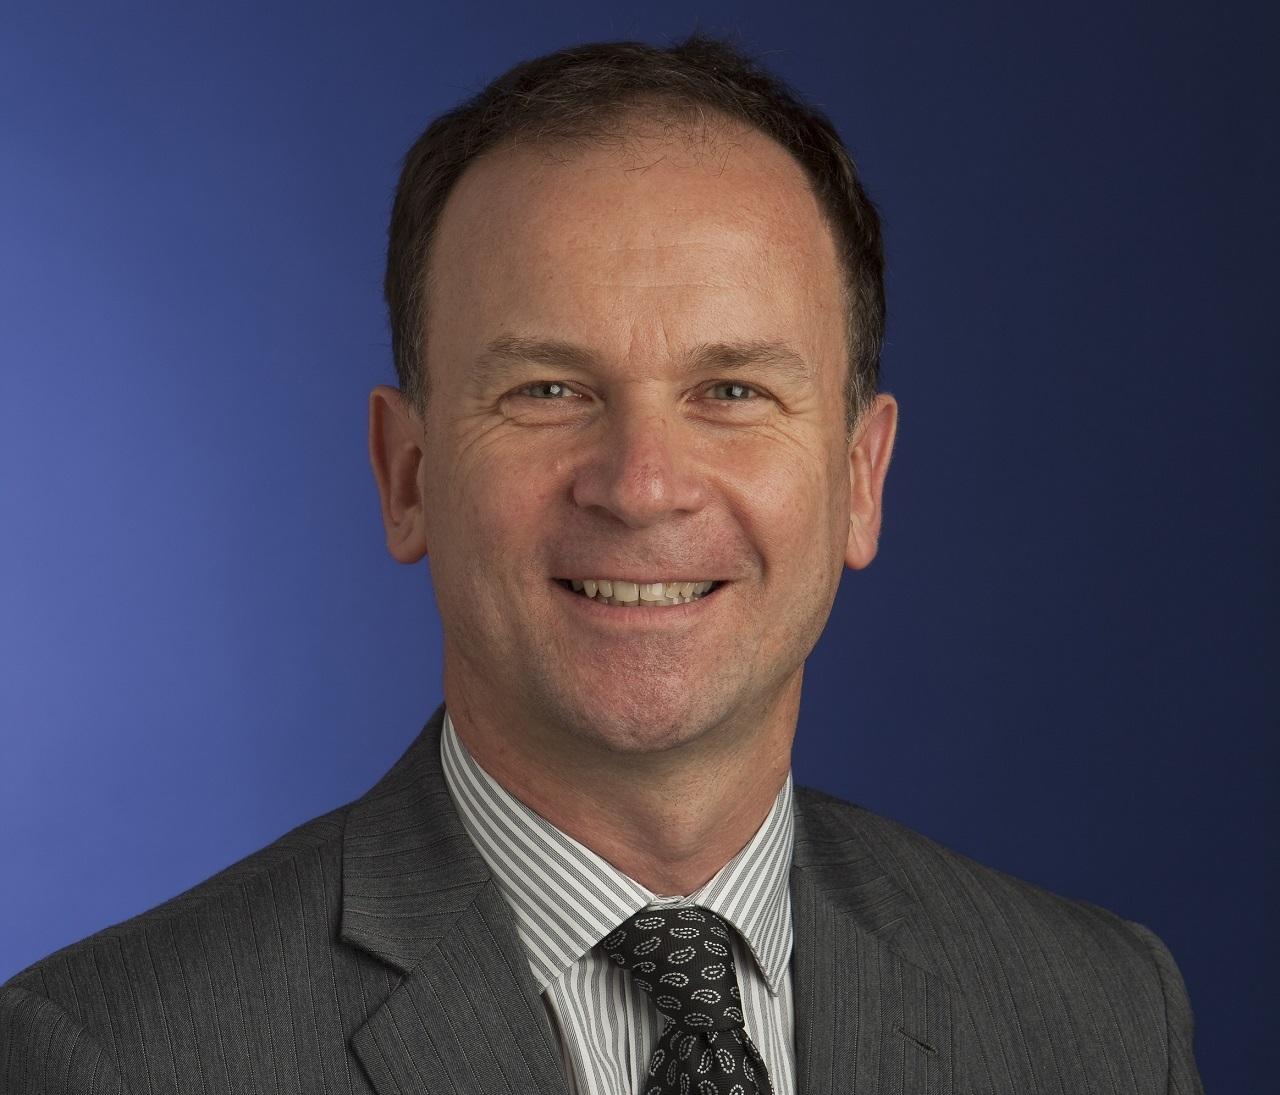 Martin Findlay, senior partner, KPMG